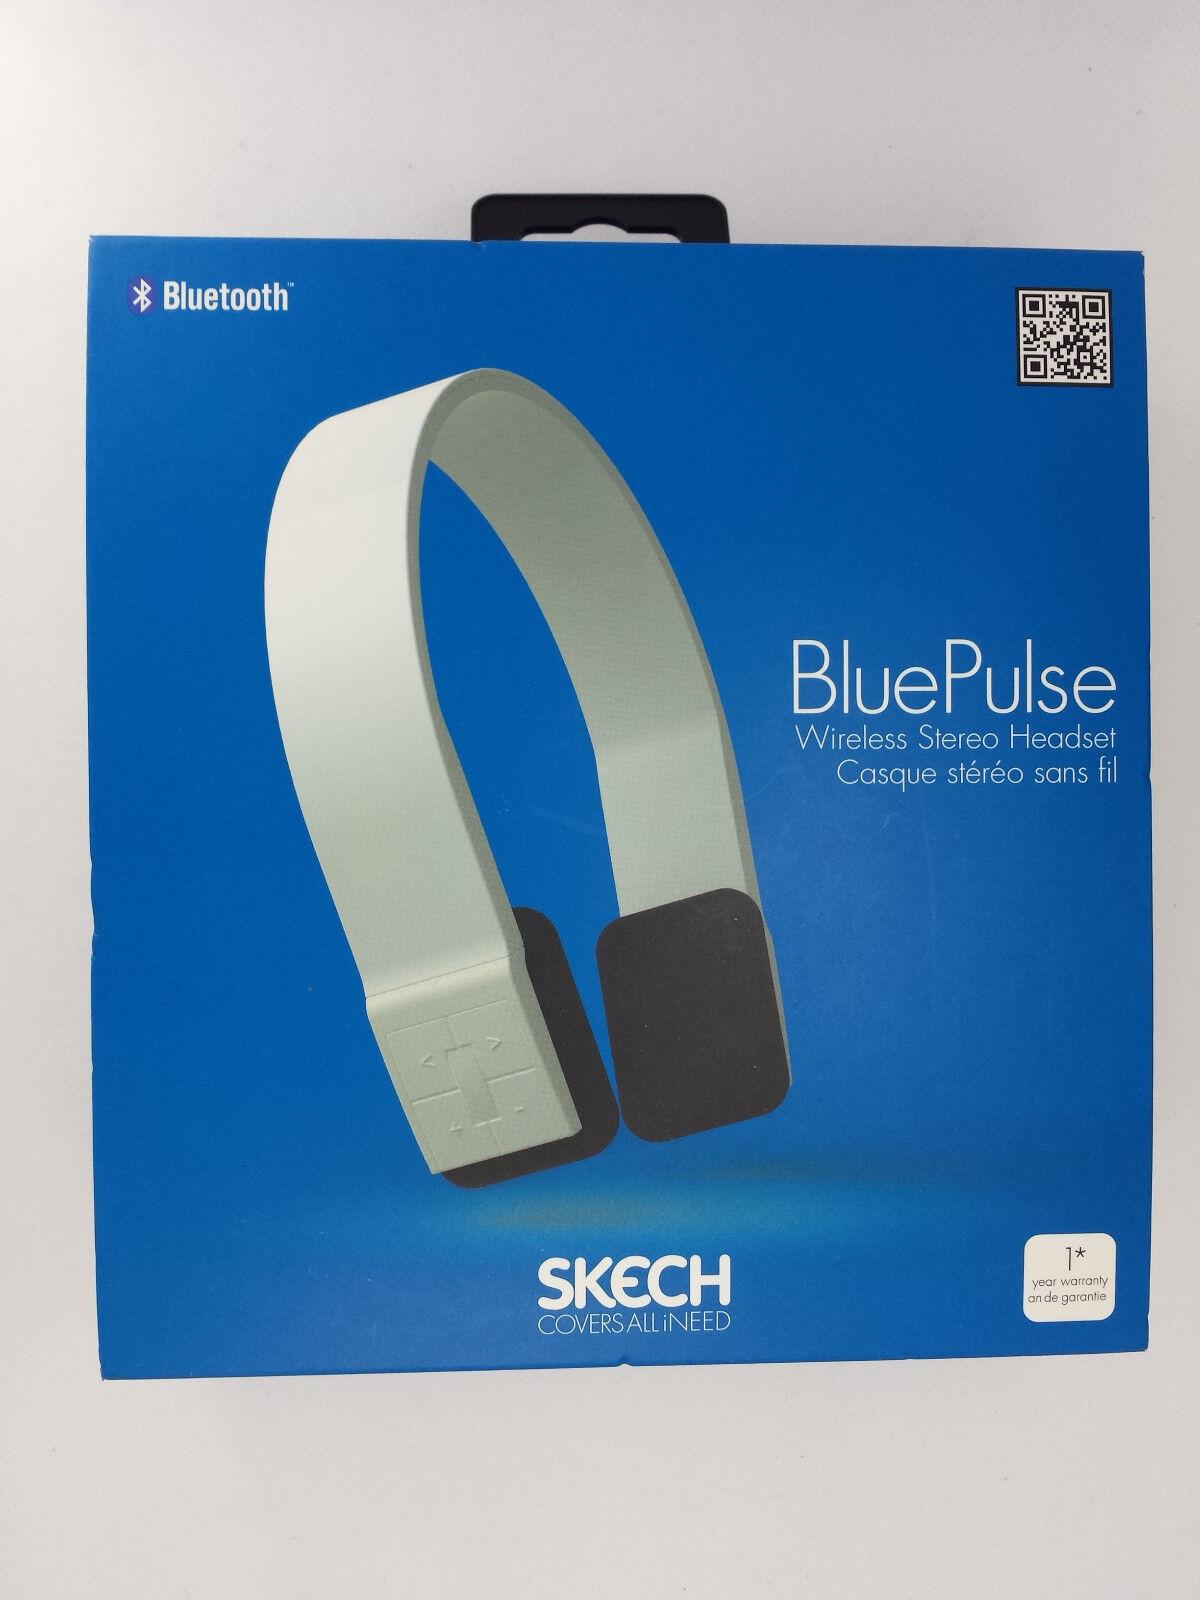 Skech Bluetooth Headphones Bth561 User Manual